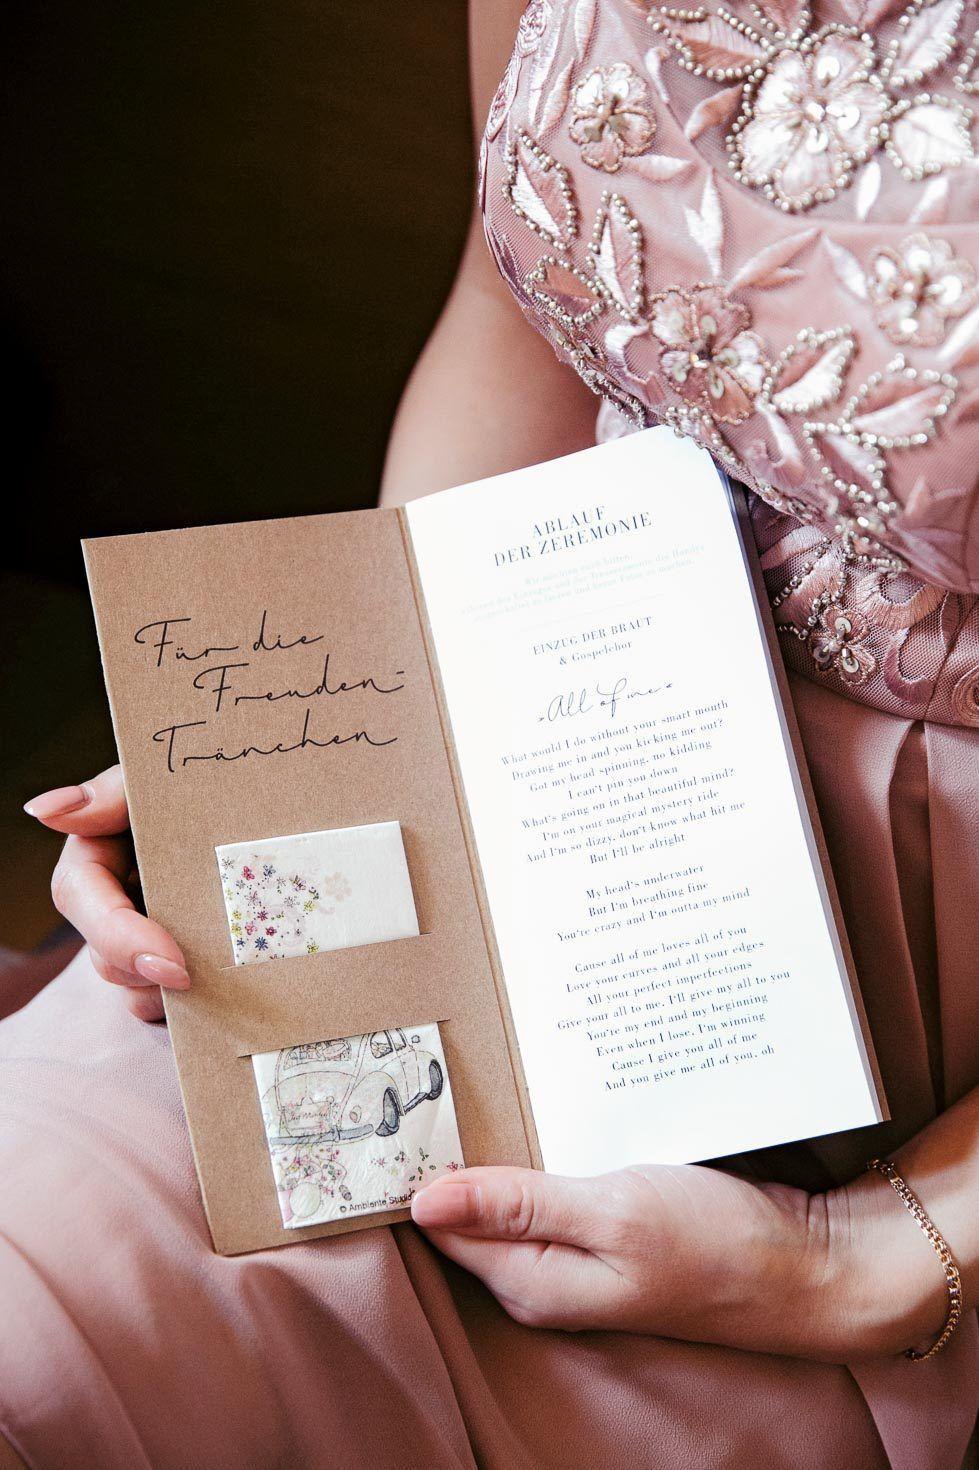 Kirchenheft Hochzeit Unzahlige Tipps Beispiele Und Vorlagen Beispiele Hochzeit Kirchenh Invitaciones De Boda Pasteles De Bodas Rusticas Anuncio De Boda